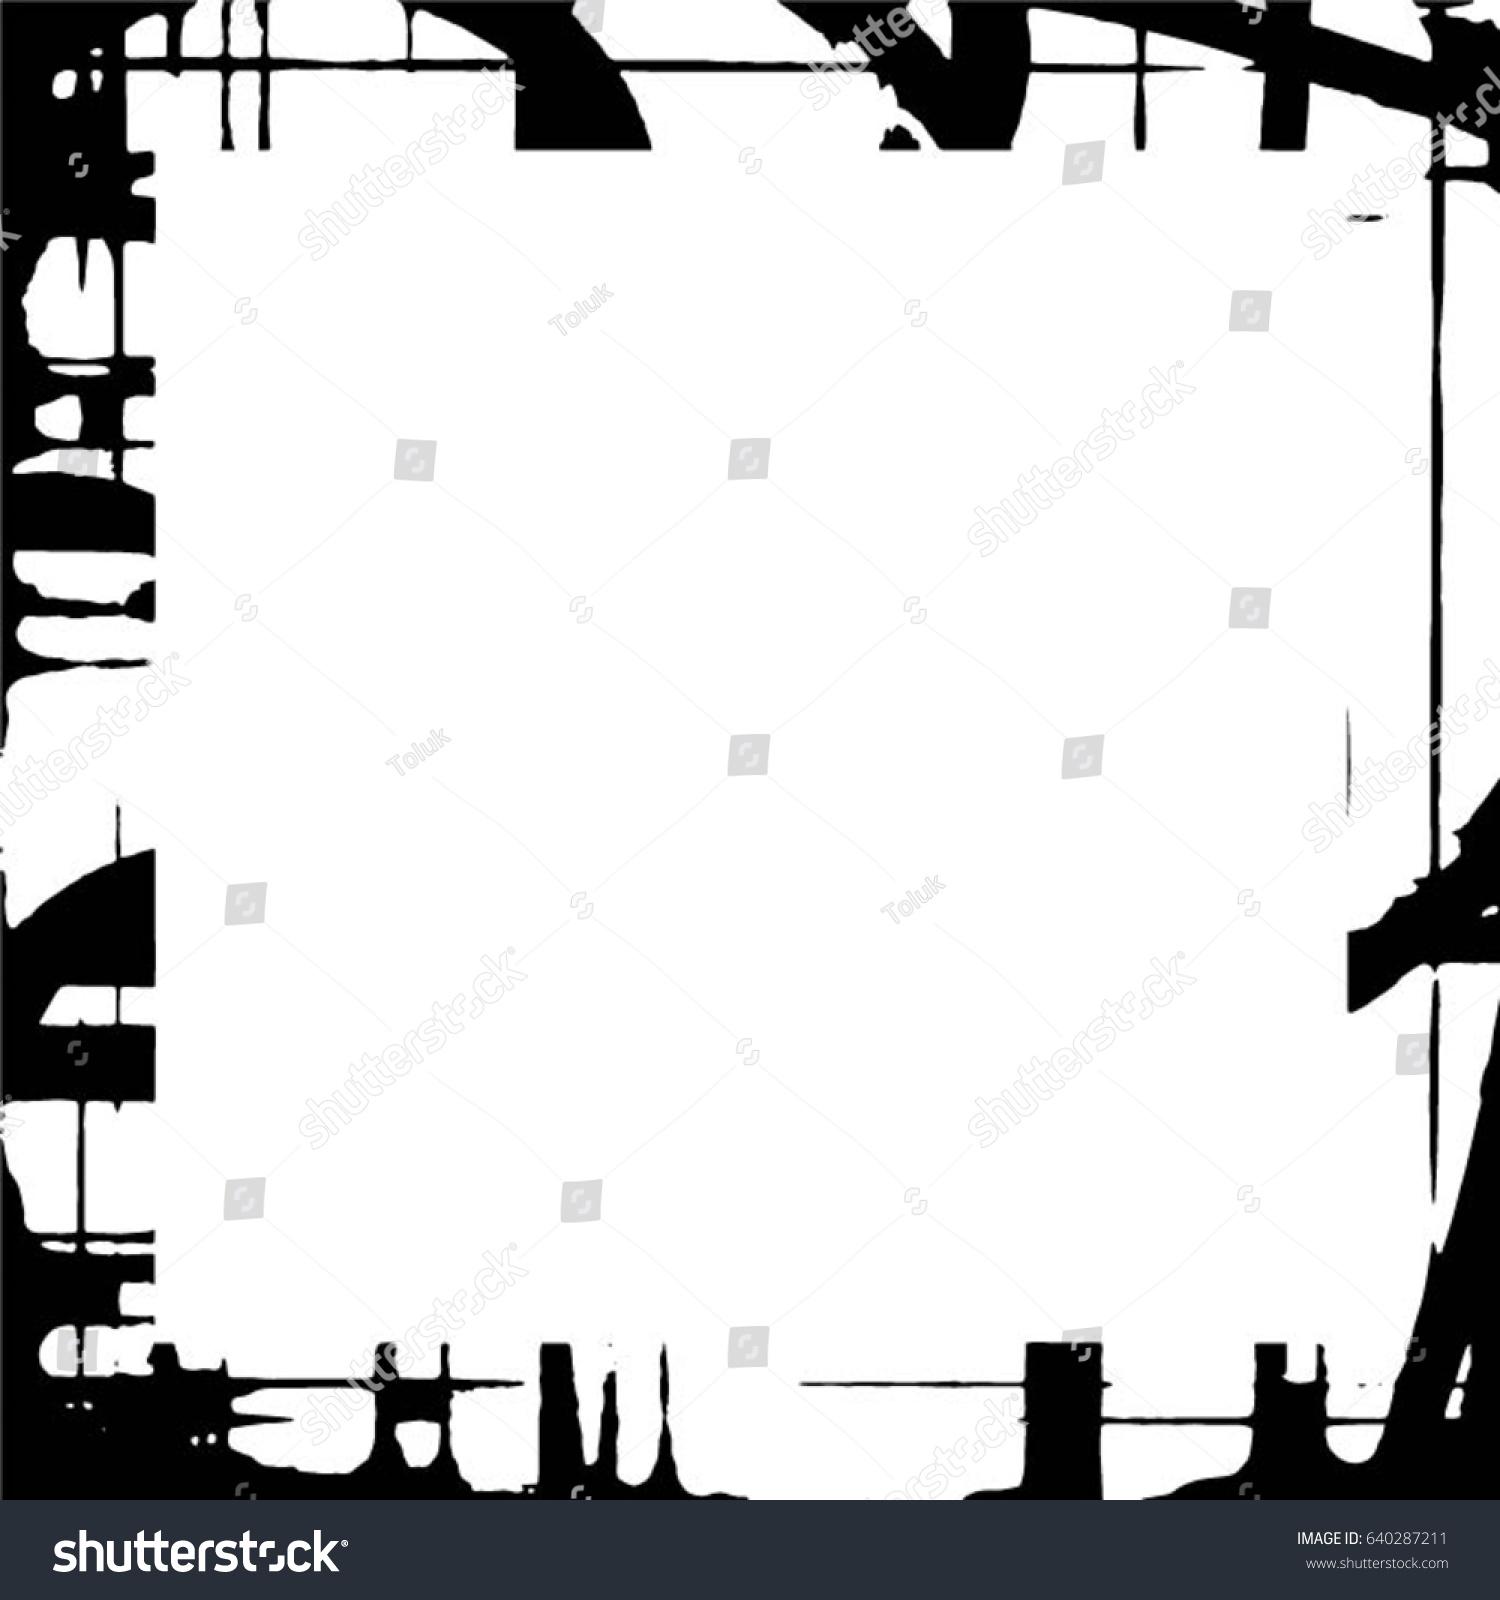 grunge black white square distressed frame のベクター画像素材